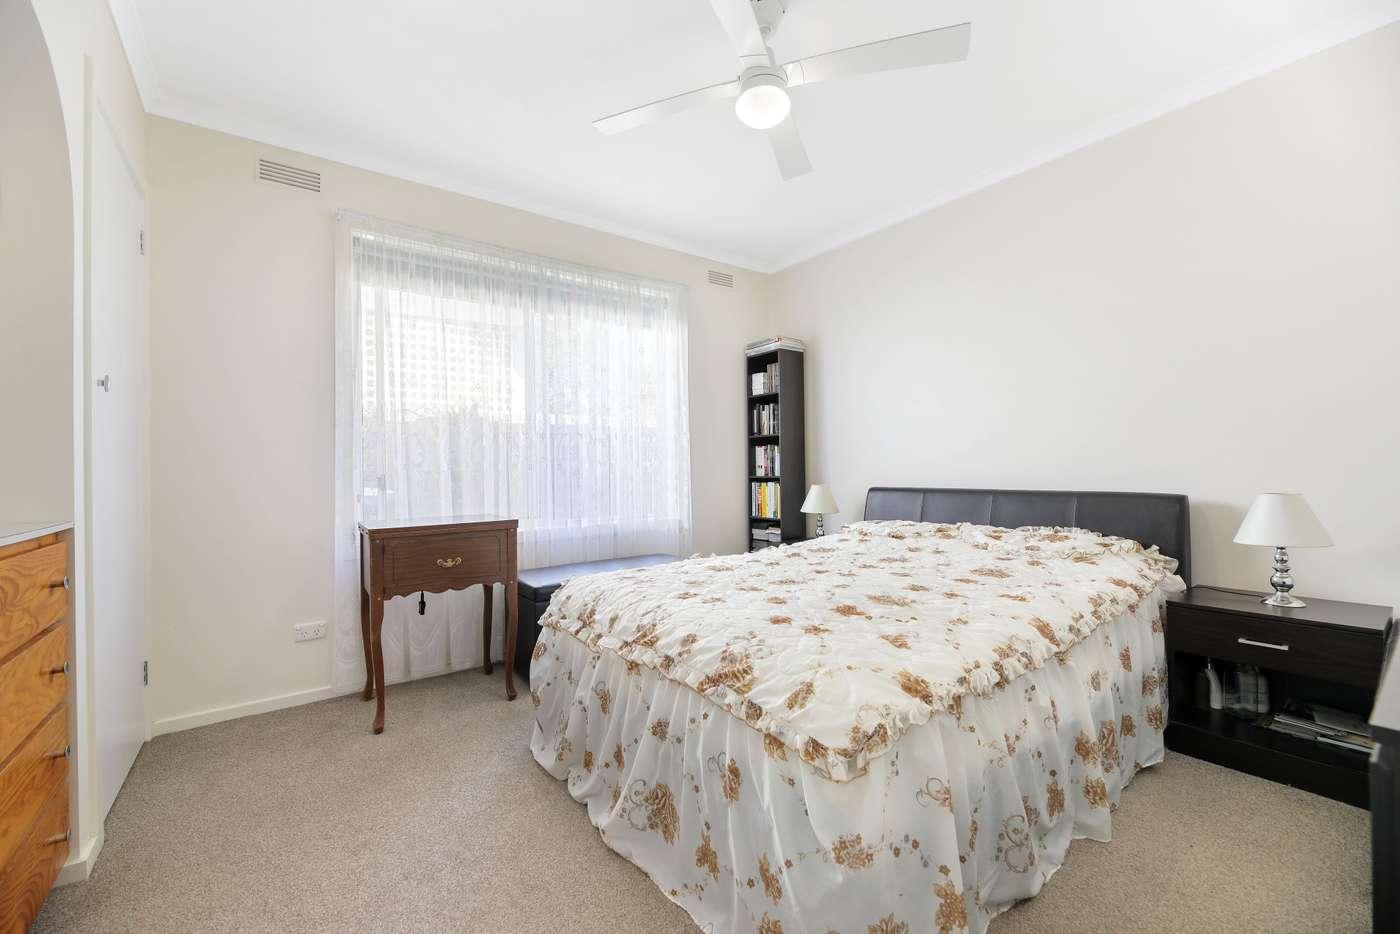 Seventh view of Homely house listing, 80 Anzac Road, Trafalgar VIC 3824